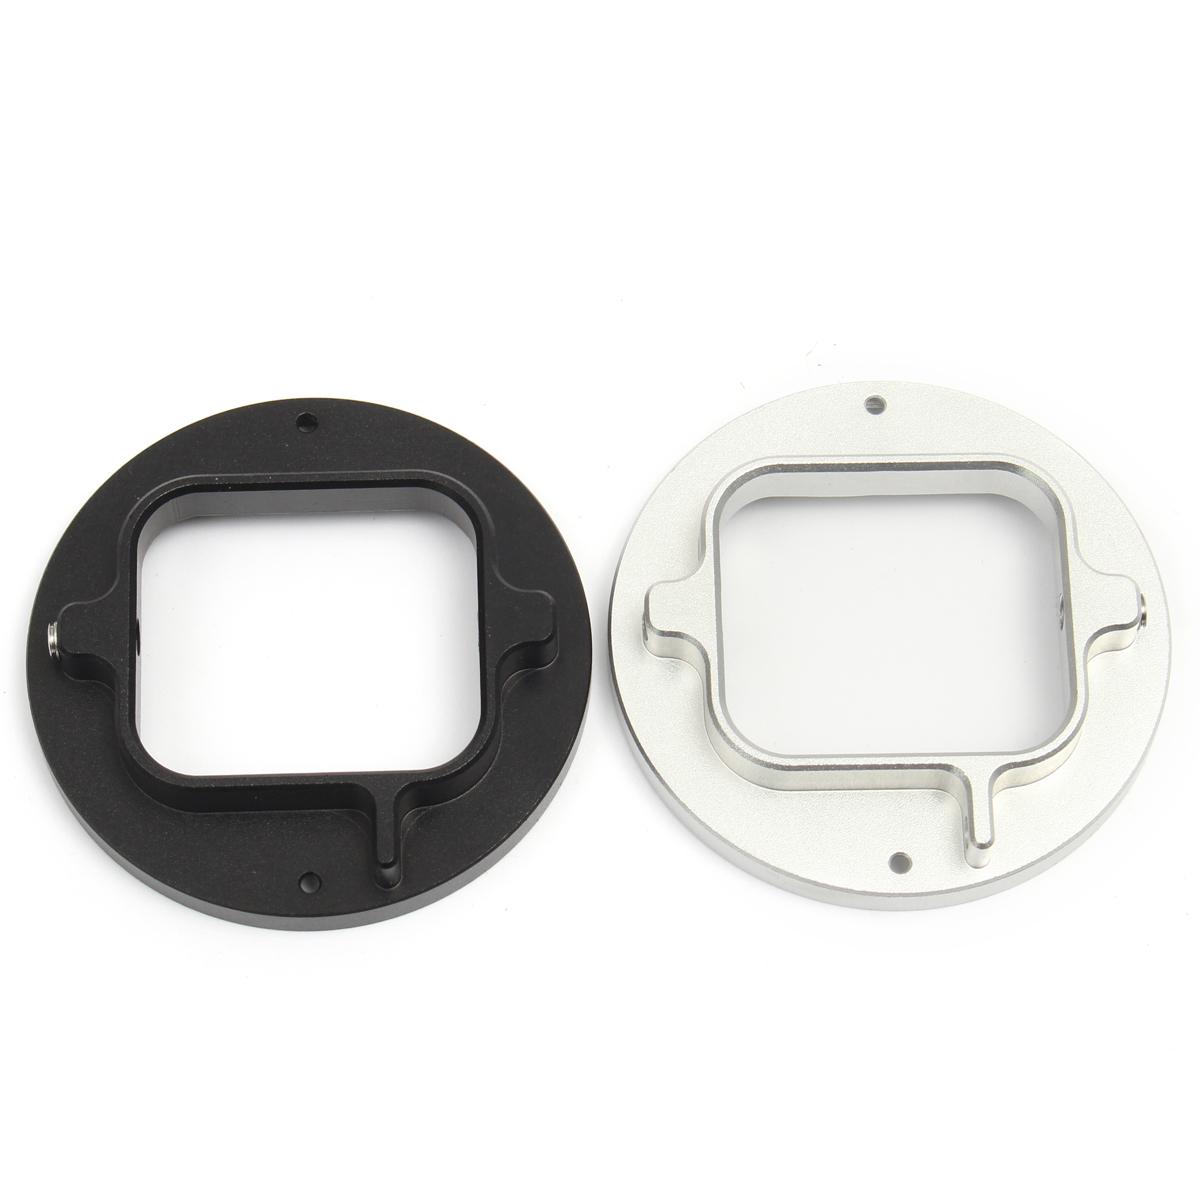 Aluminium Alloy 52mm Diving Filter Lens Adapter Ring Accessory For Gopro Hero 5 / 6 Action Camera